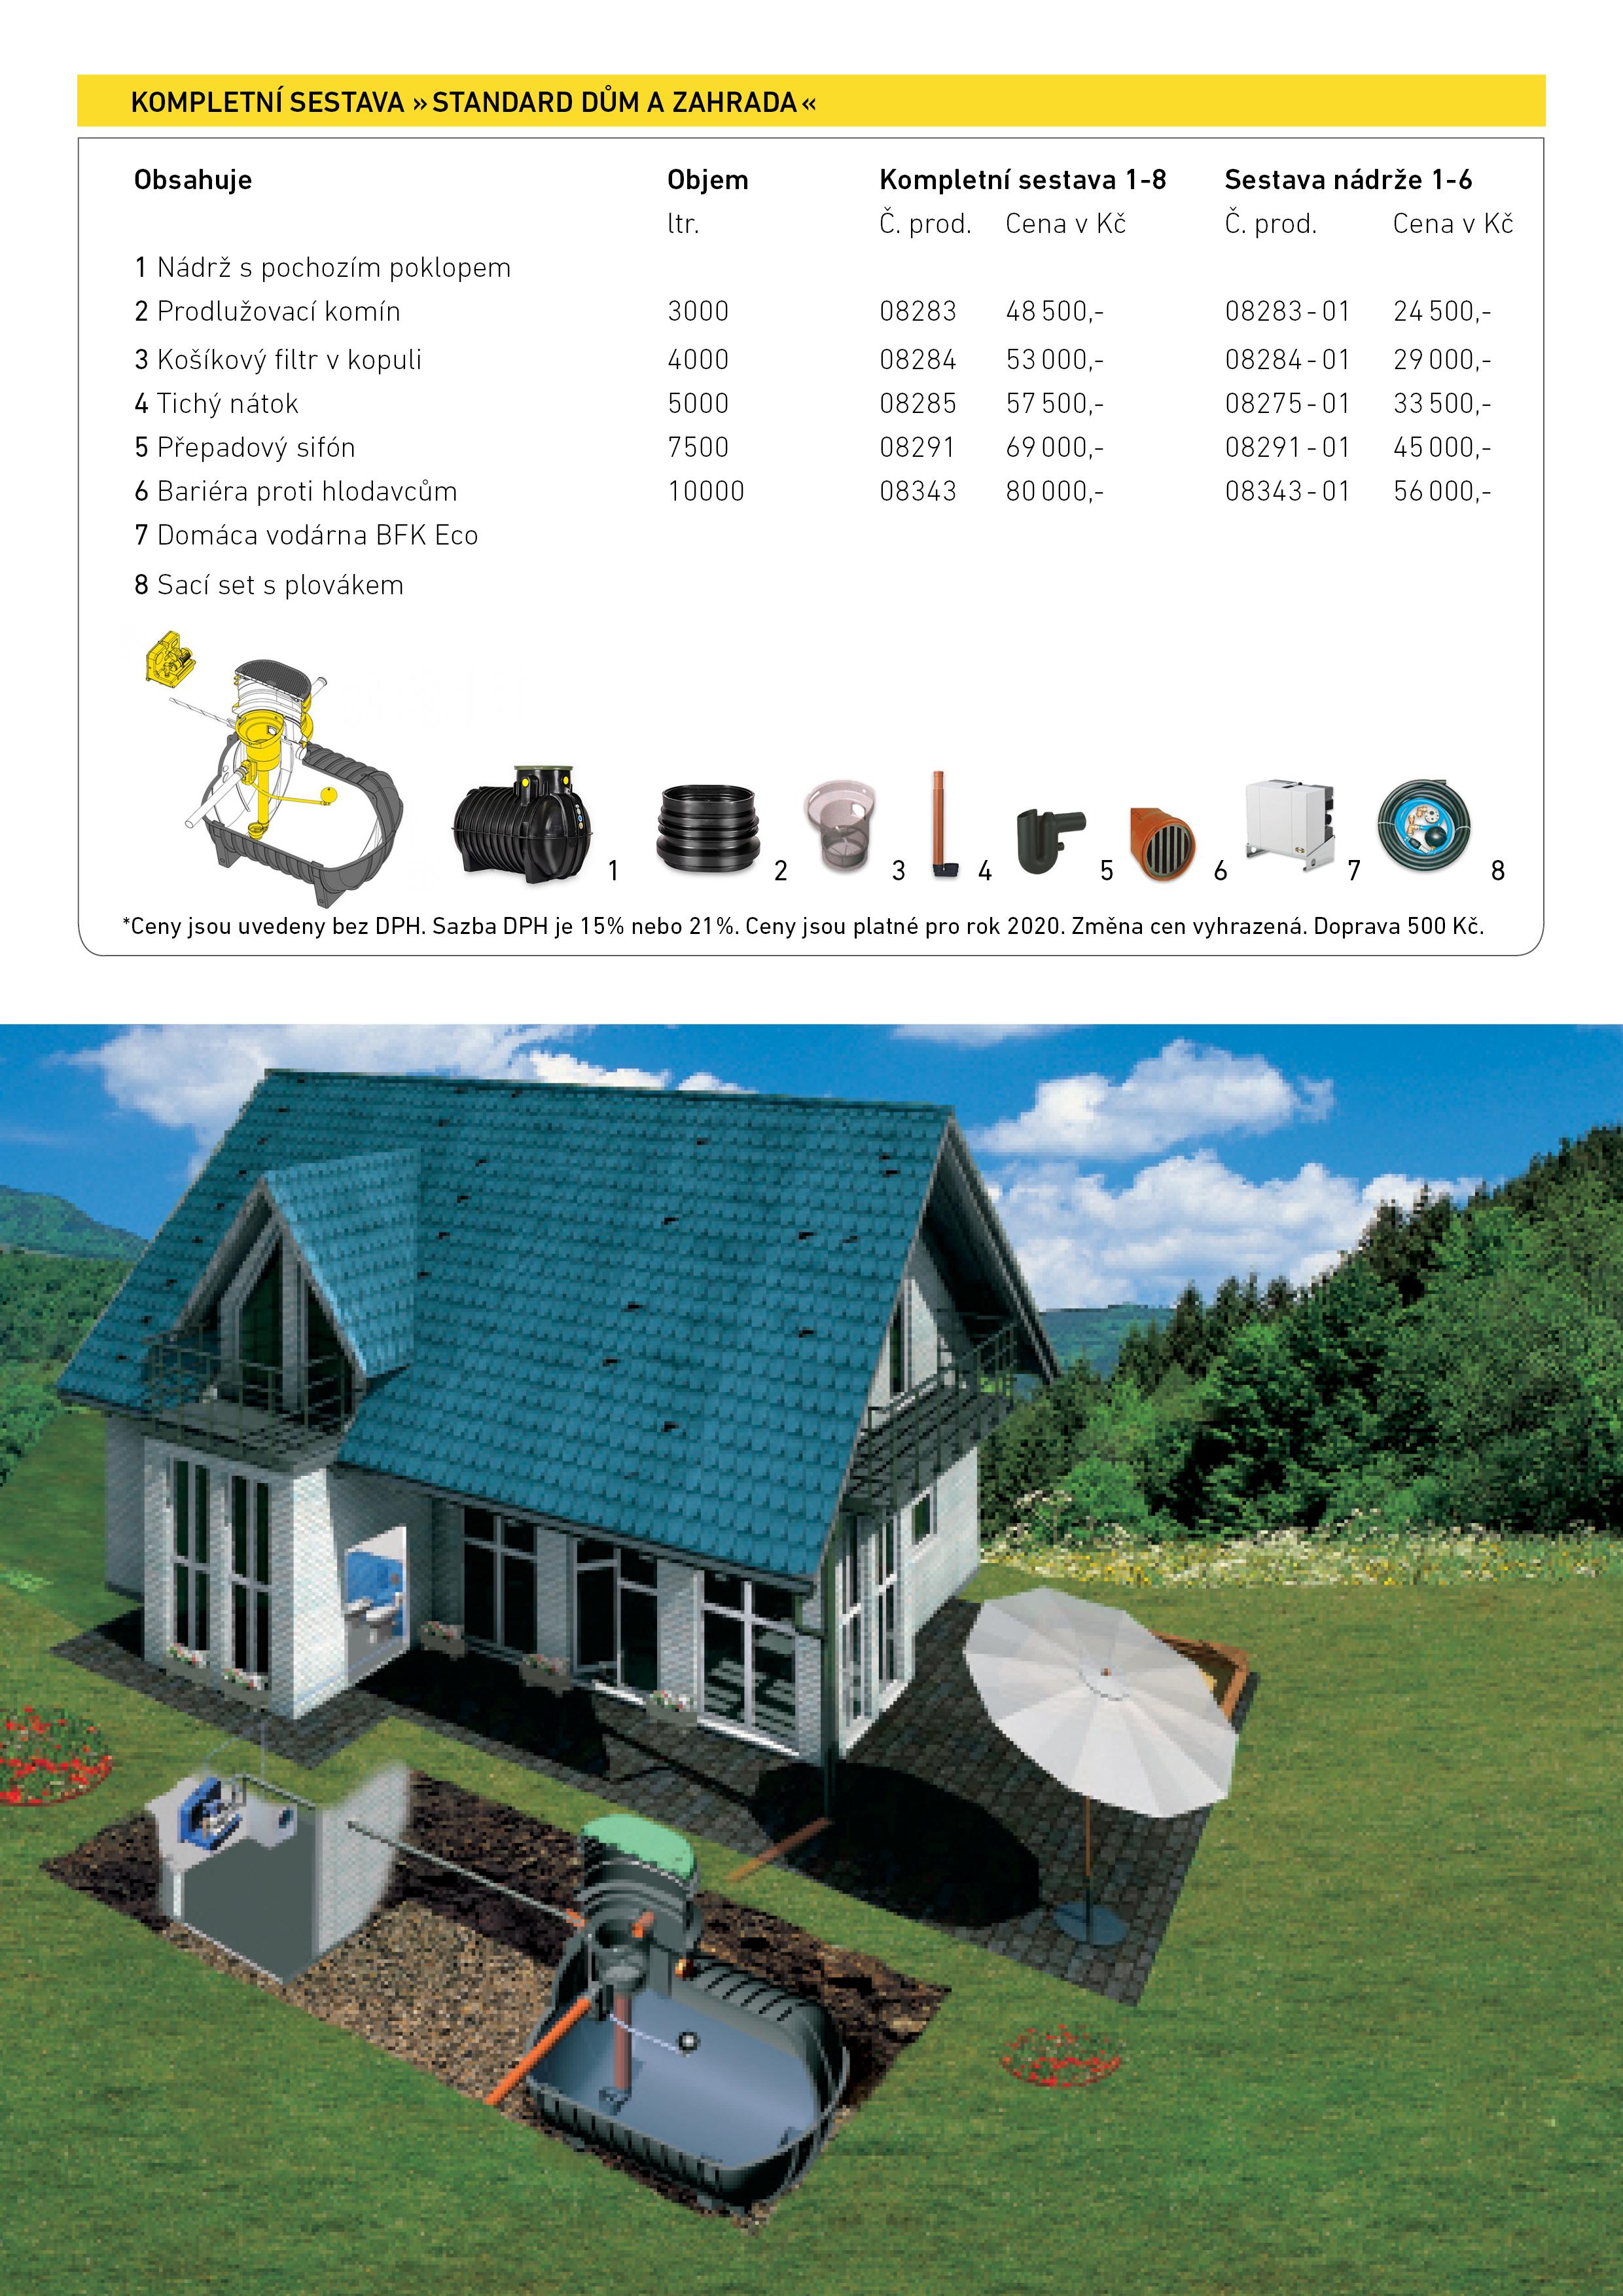 Nádrže na dešťovou vodu - sestava Standard Dům a zahrada